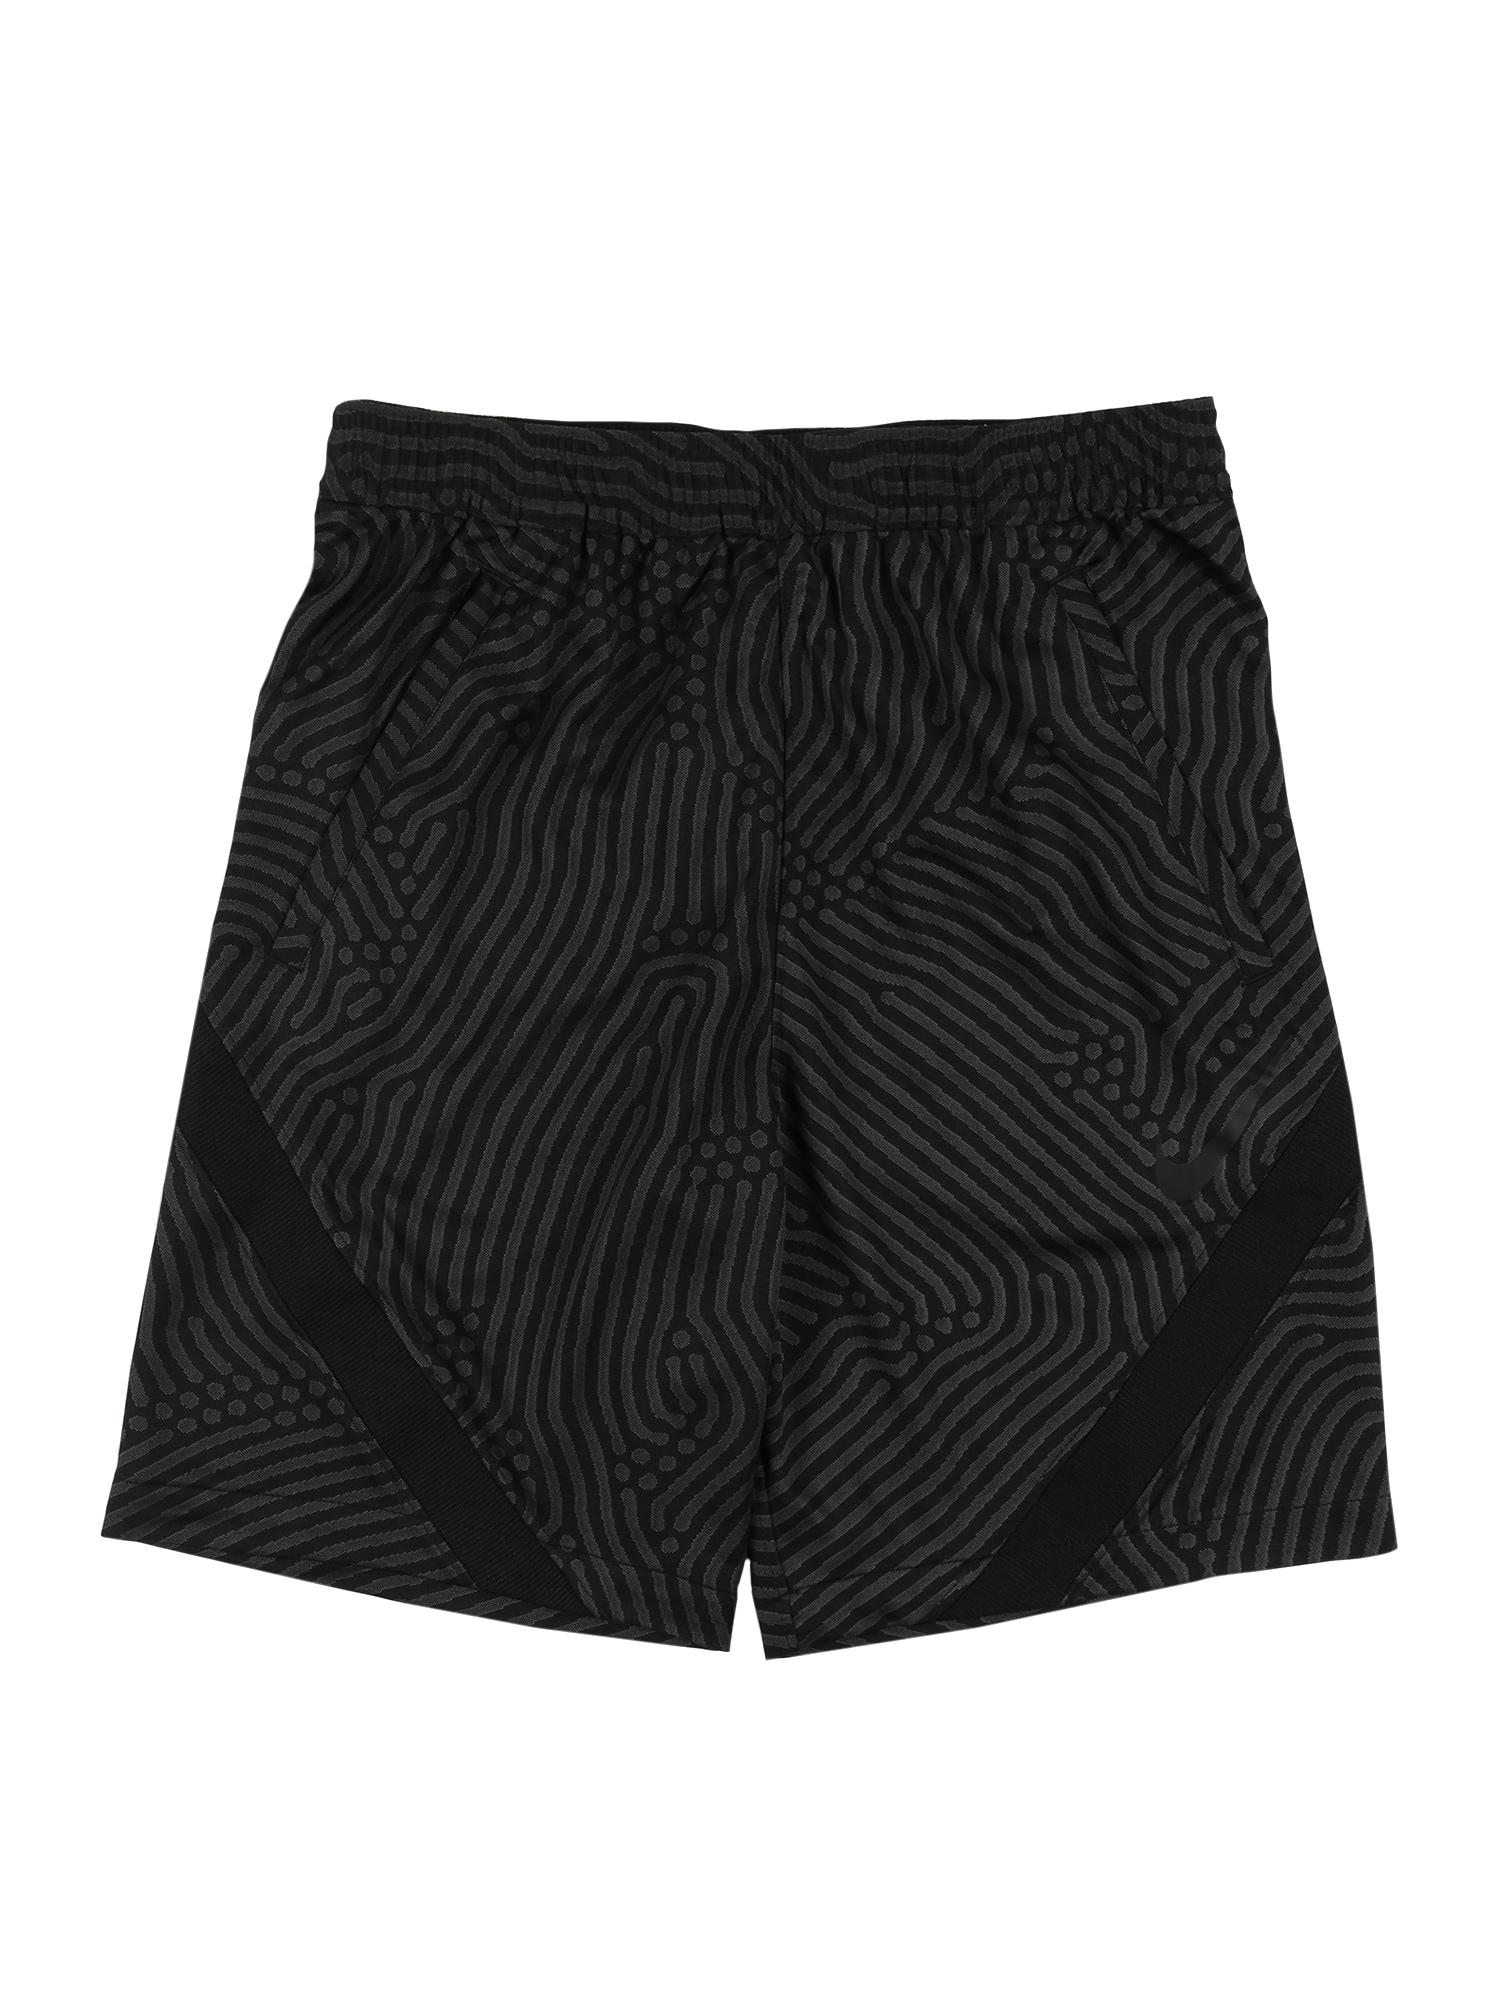 NIKE Športové nohavice 'Strike'  antracitová / čierna